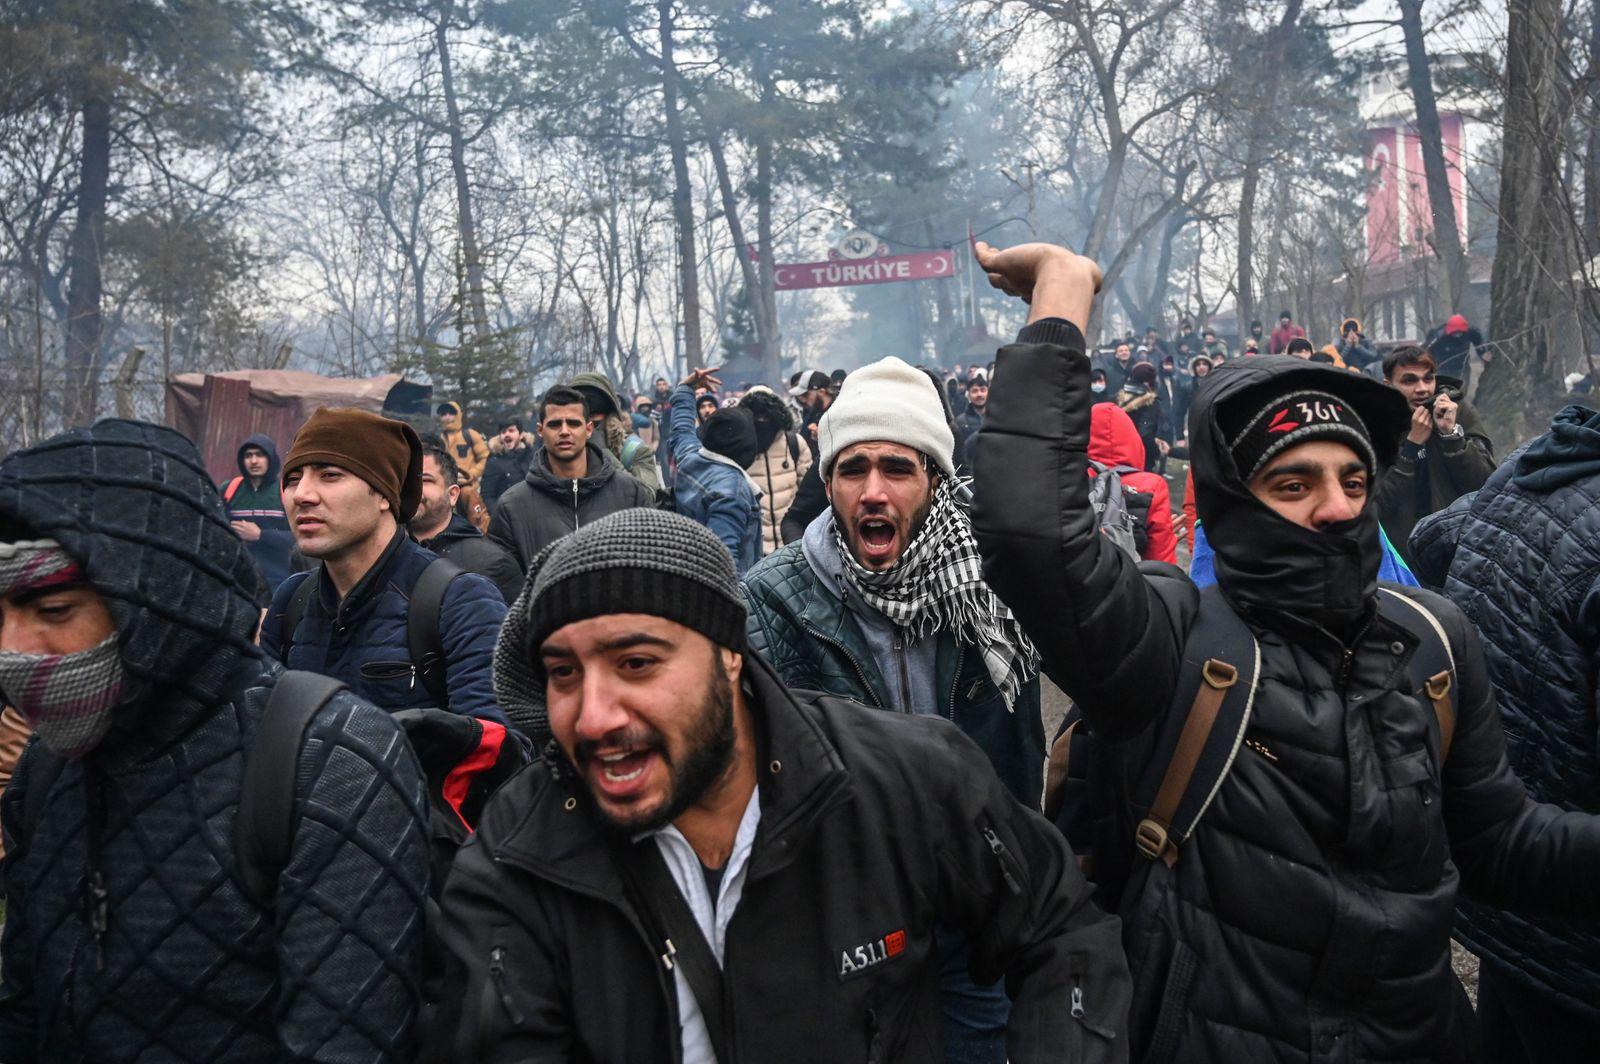 TURKEY-GREECE-EU-MIGRANTS-CONFLICT